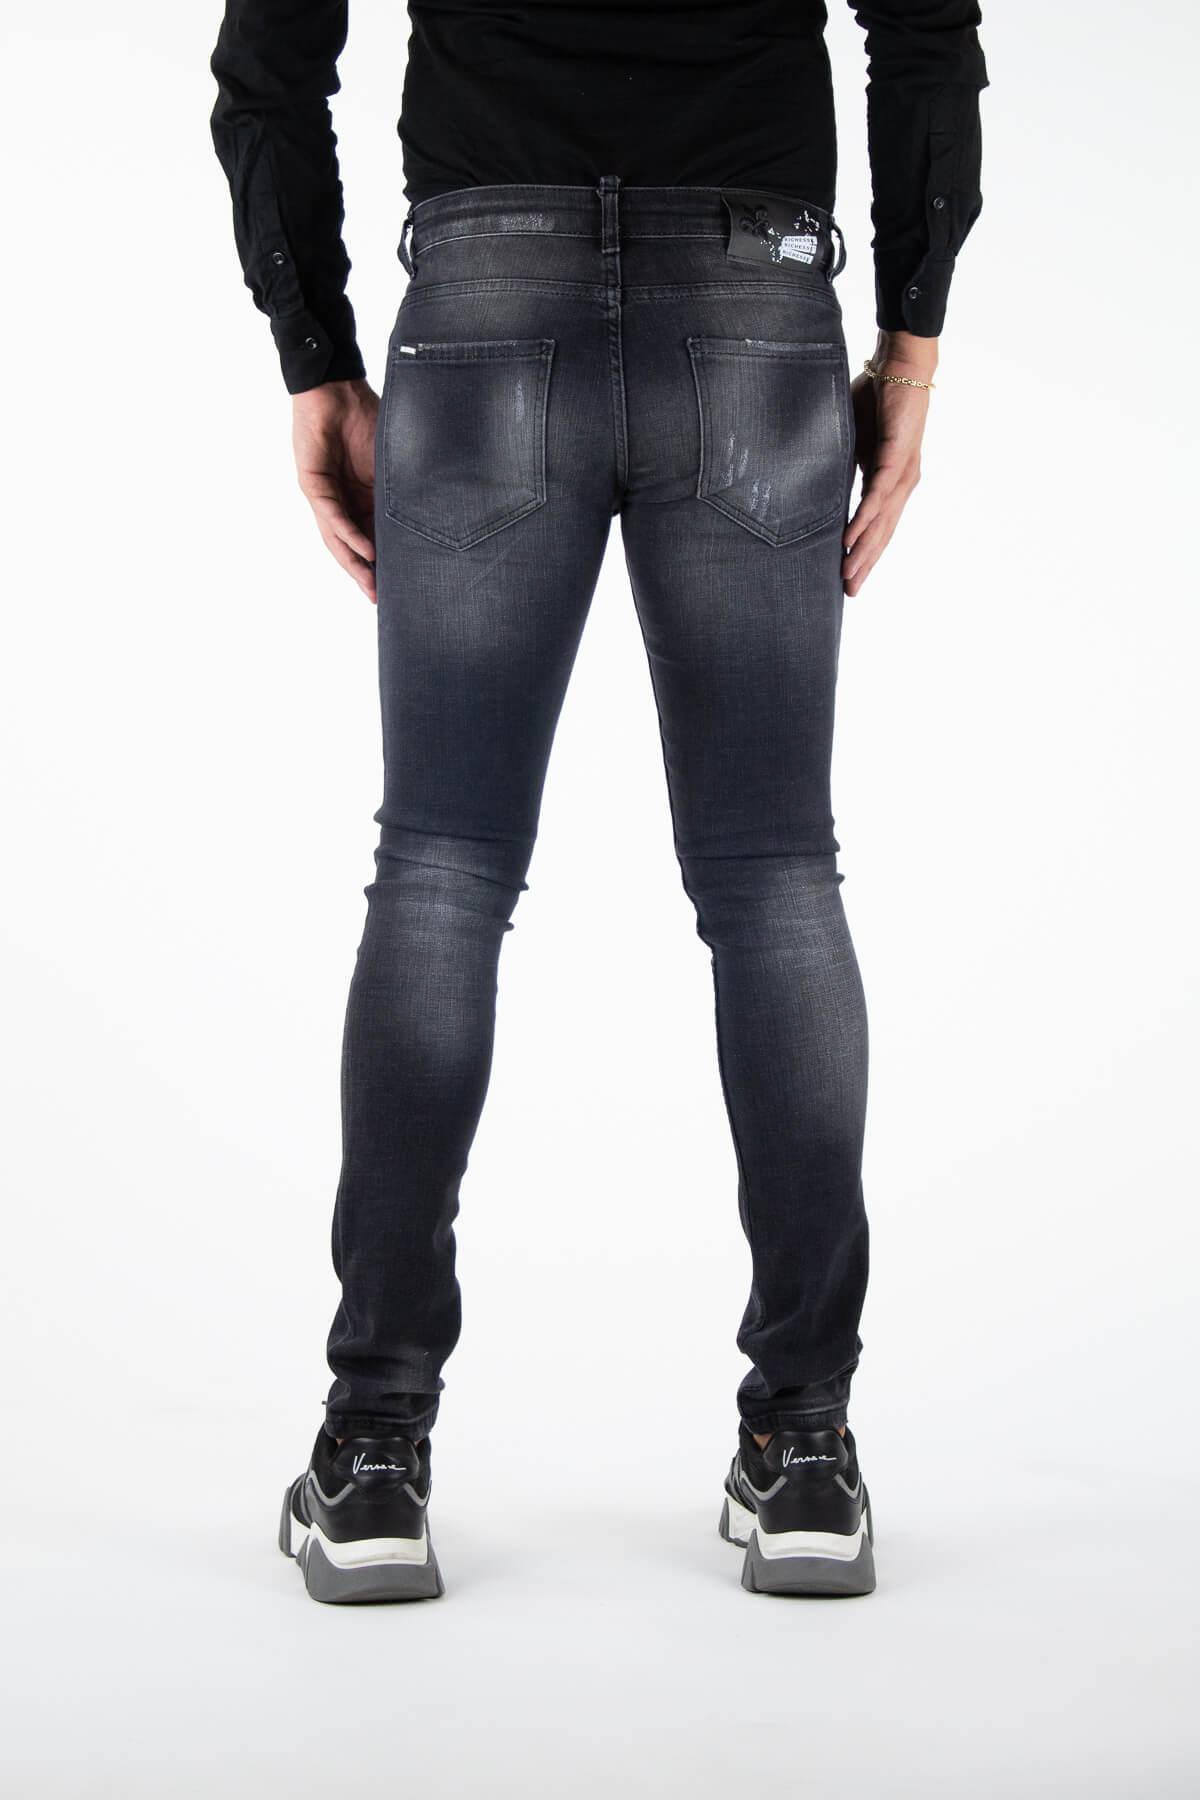 Verona Dark Jeans-4